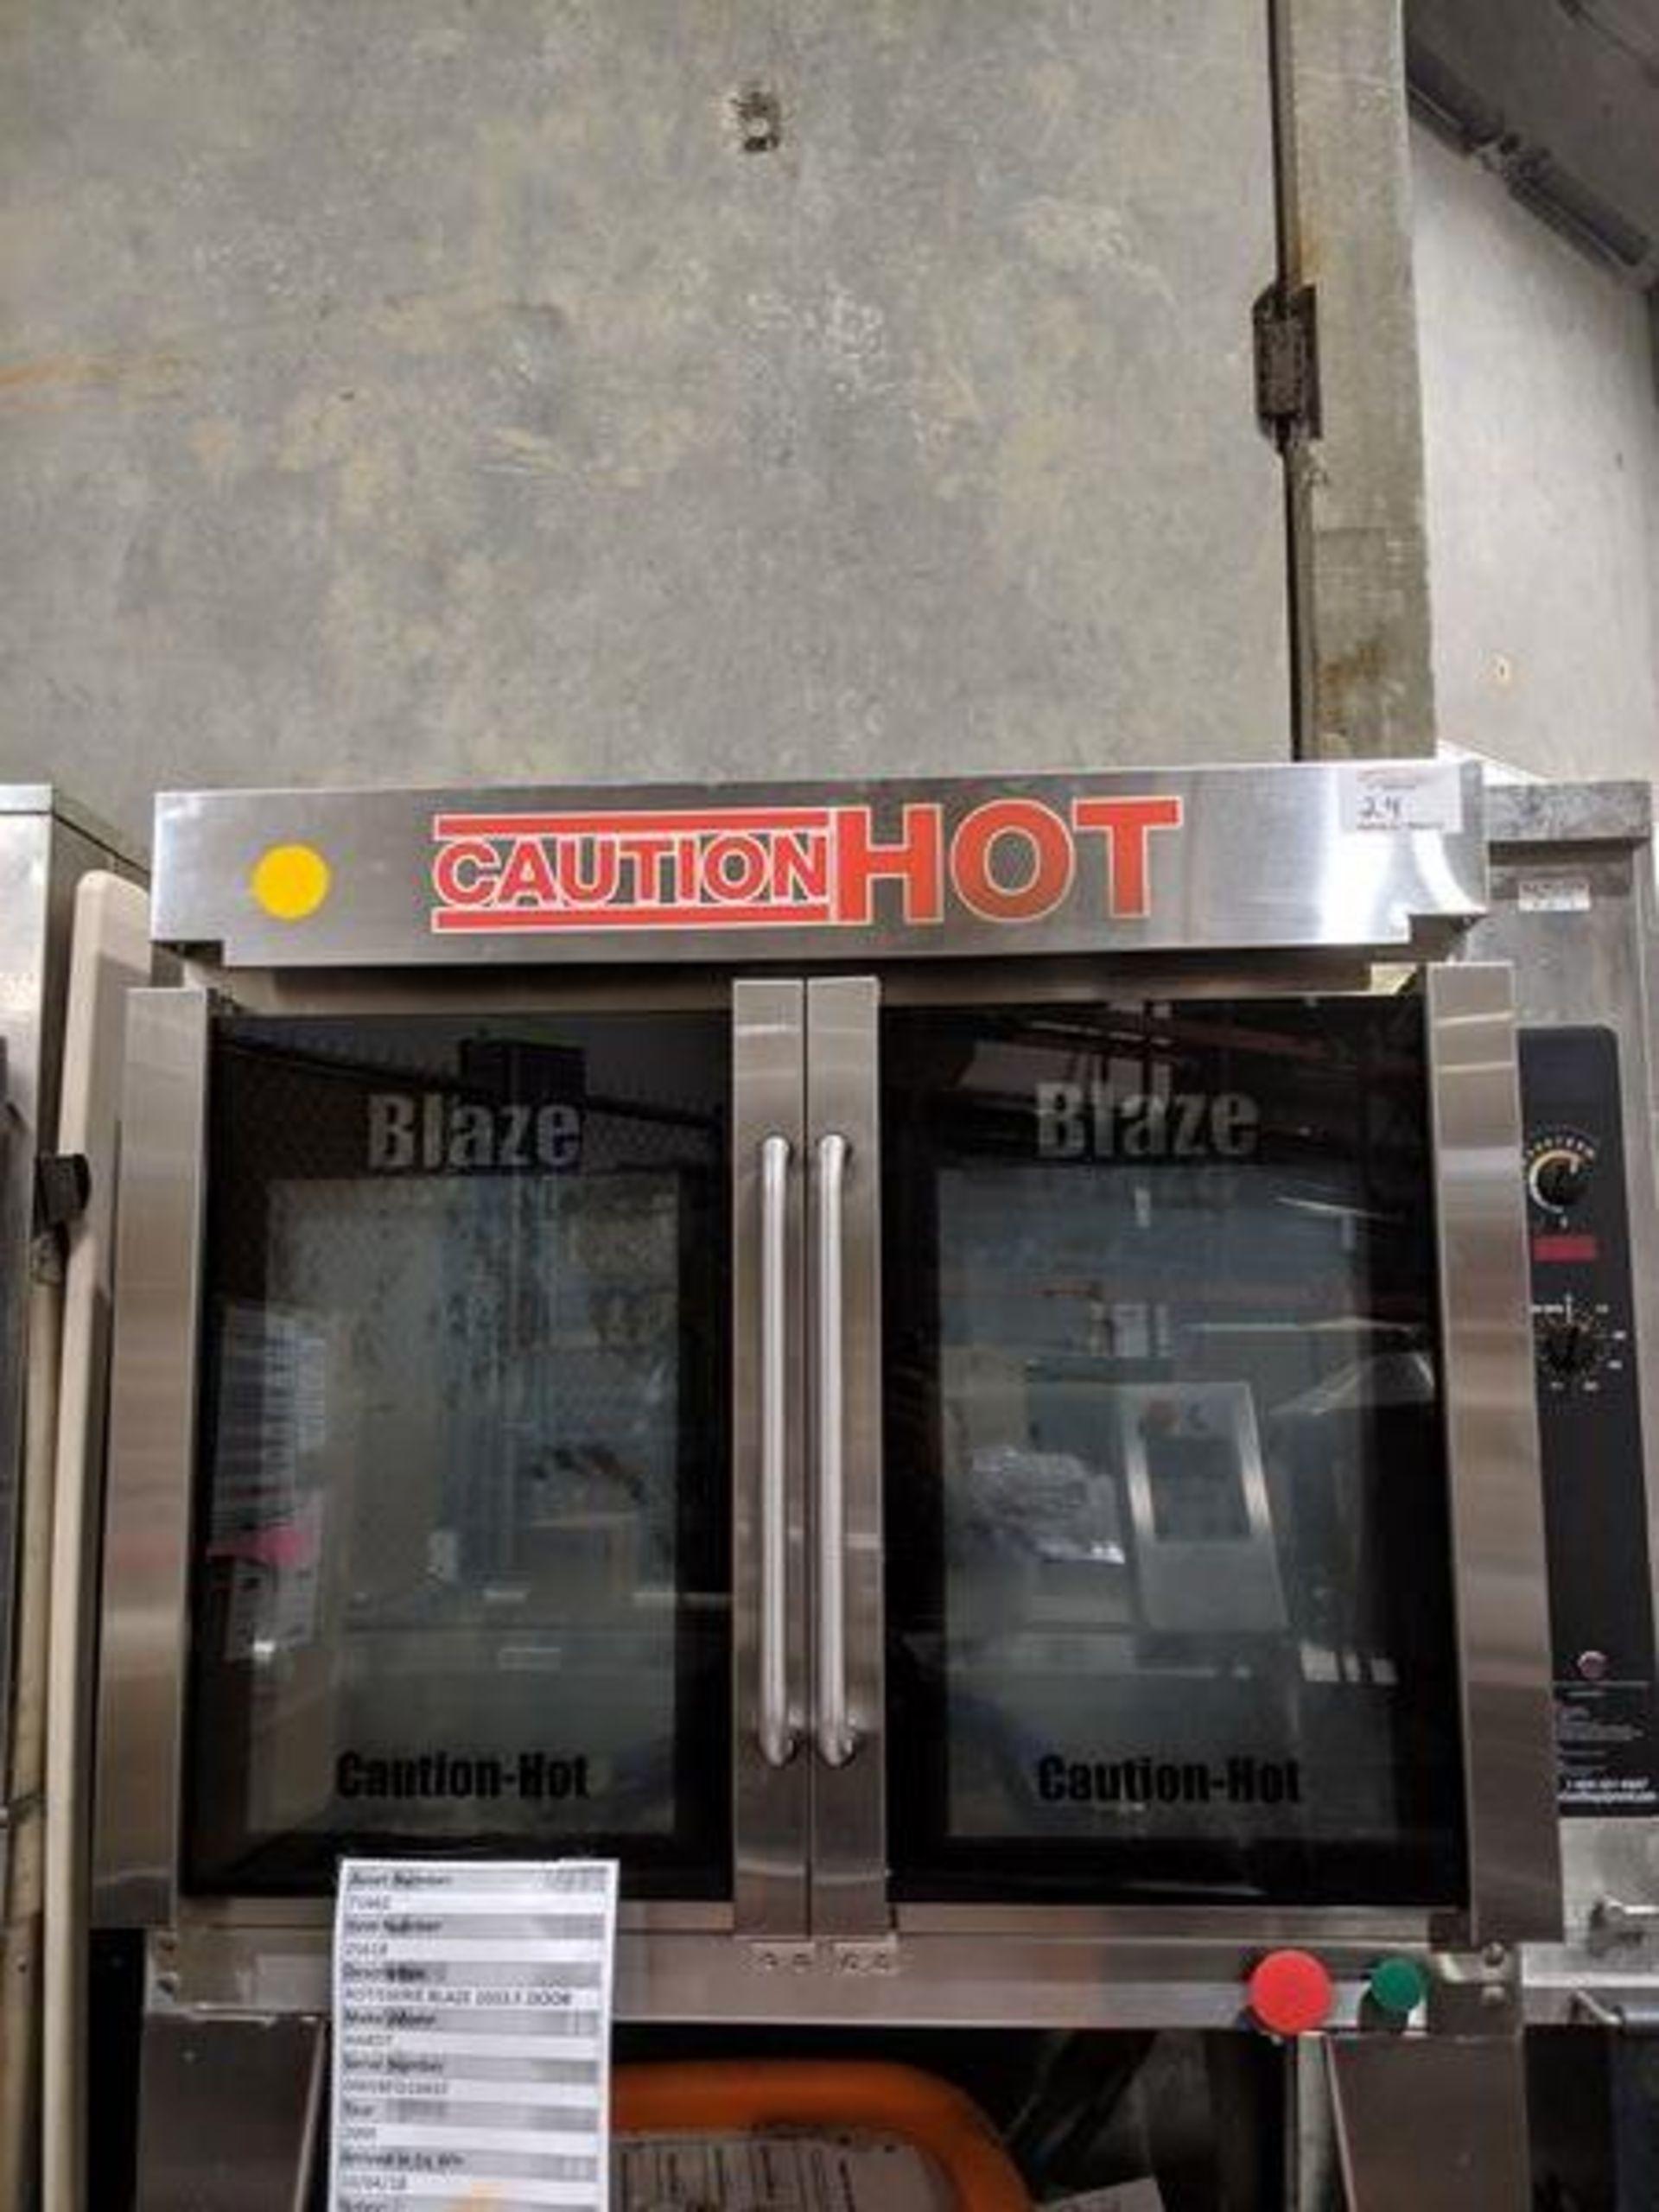 Lot 24 - Hardt Blaze 1033 Gas Chicken Rotisserie. Complete with Skewers and Orange Wash Tub